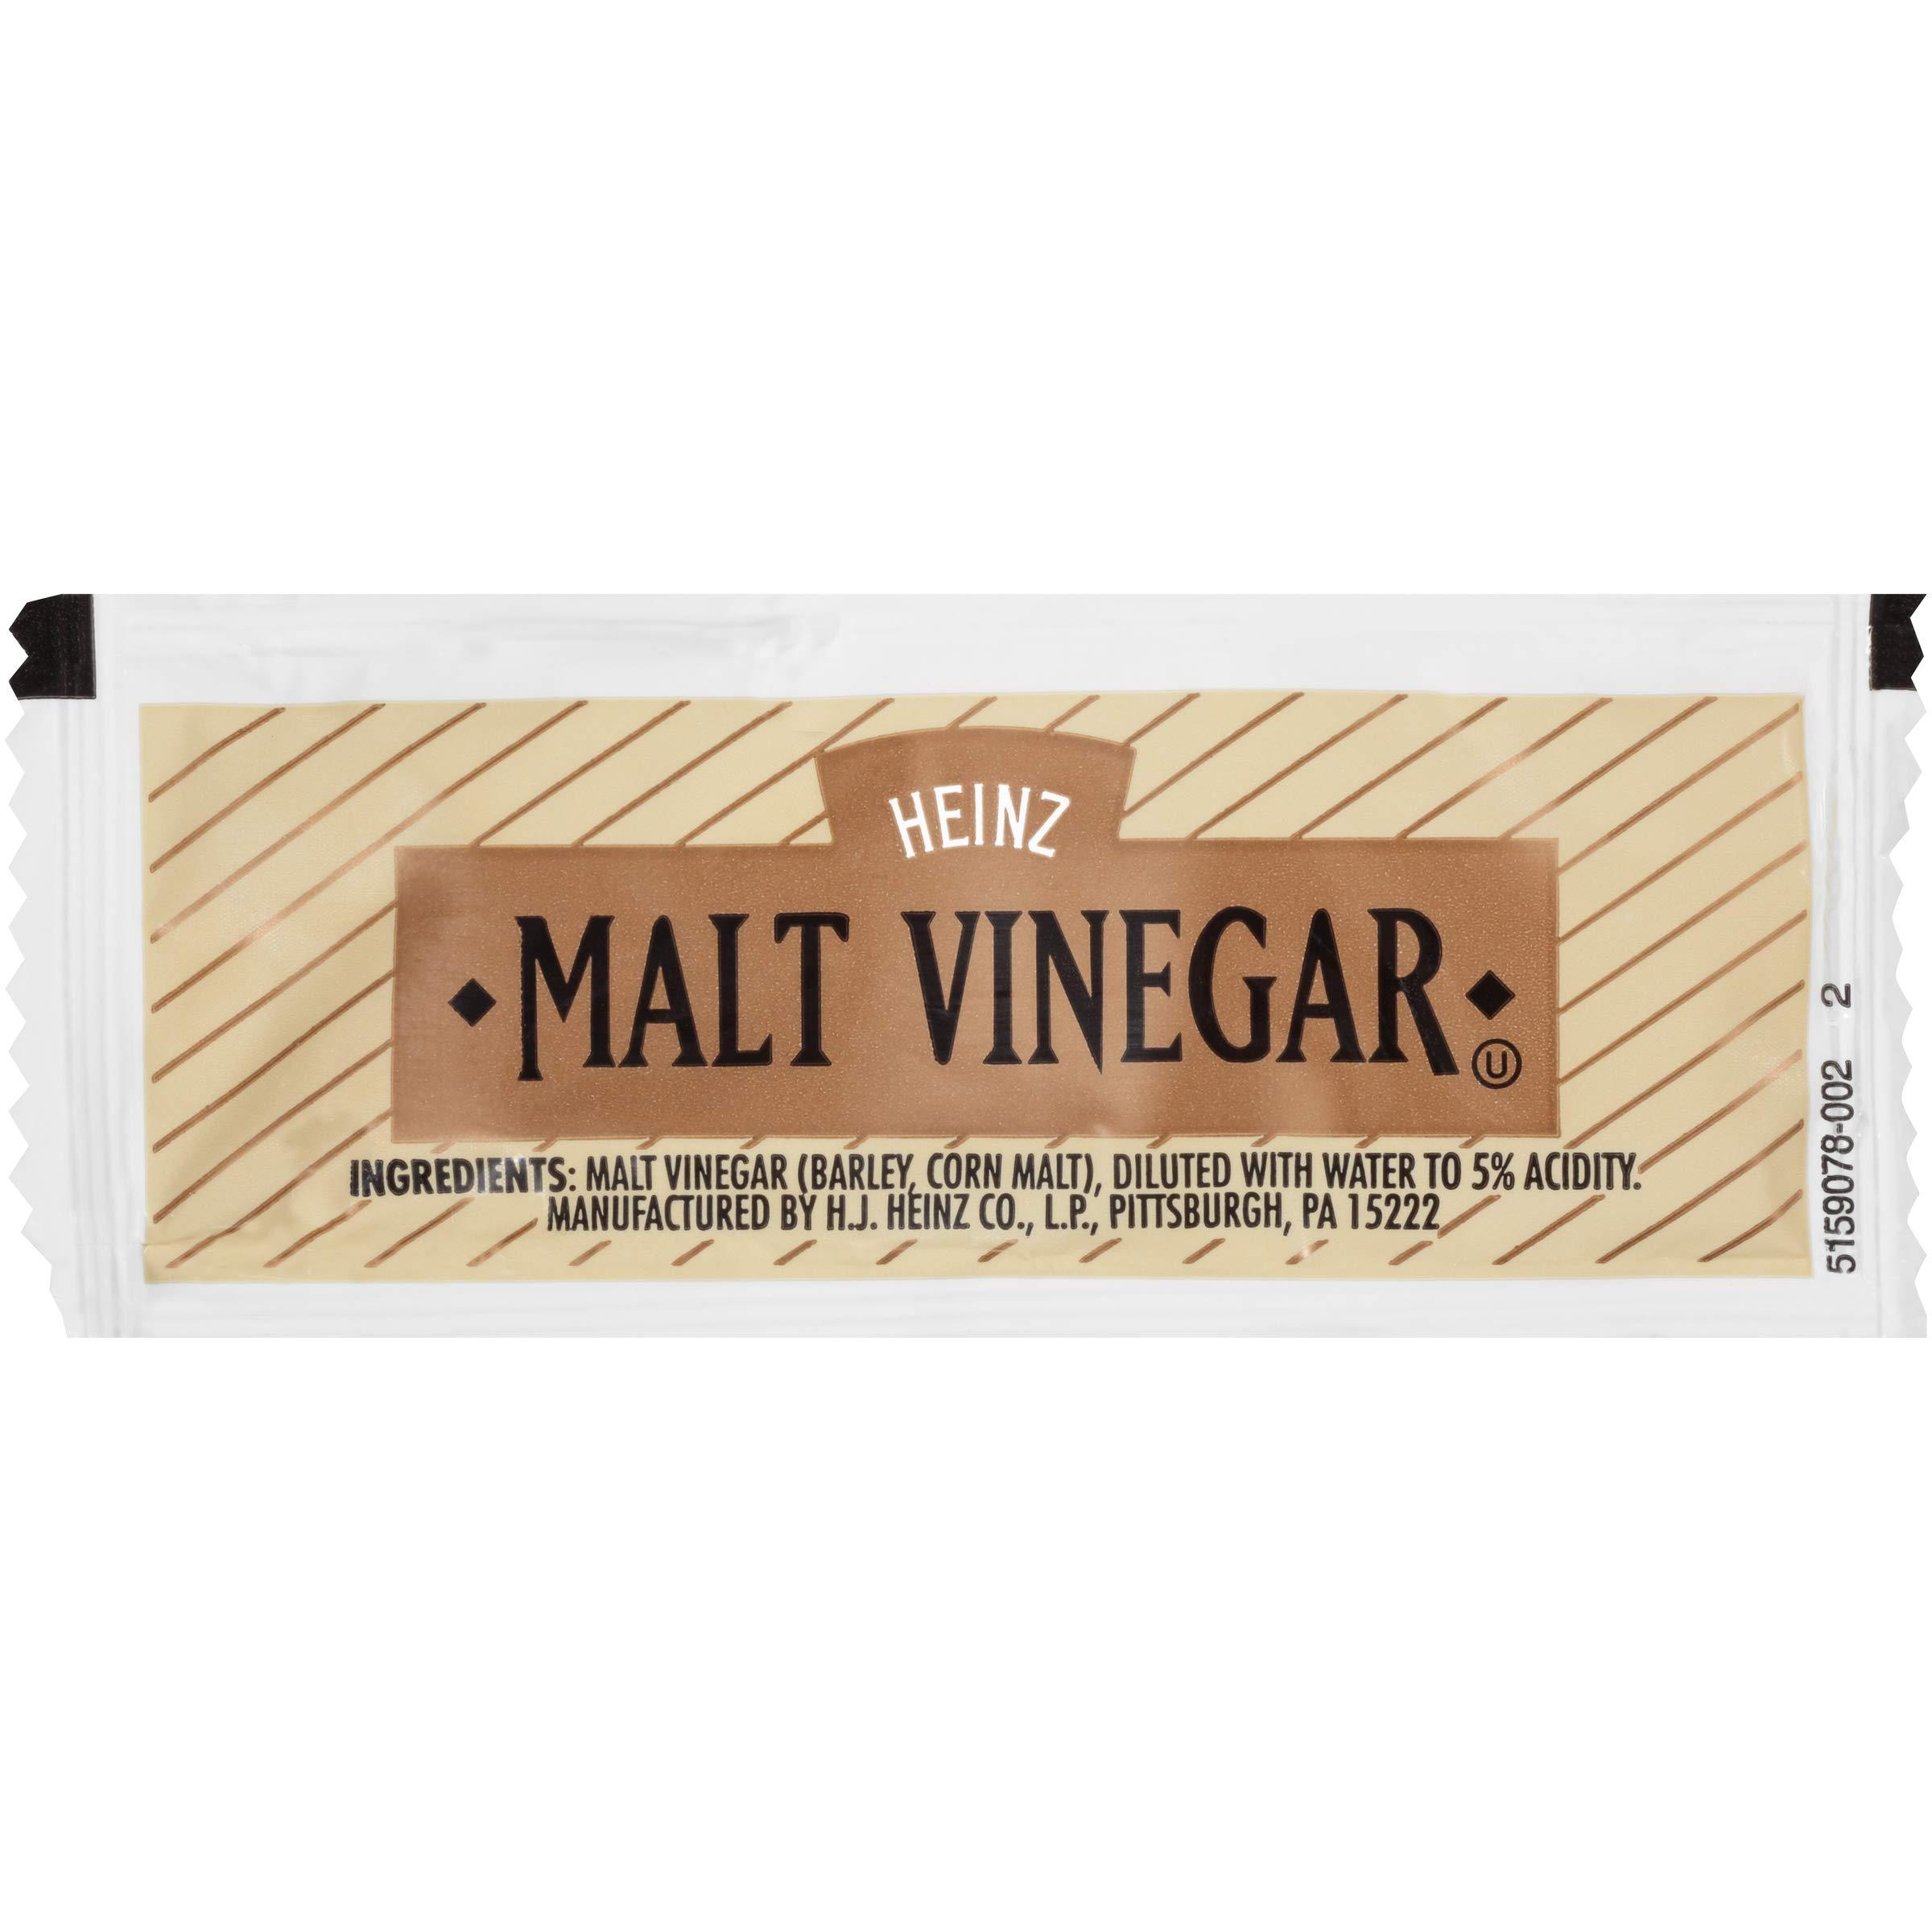 Heinz Single Serve Malt Vinegar, 9 grams Packets (Pack of 200). by Heinz